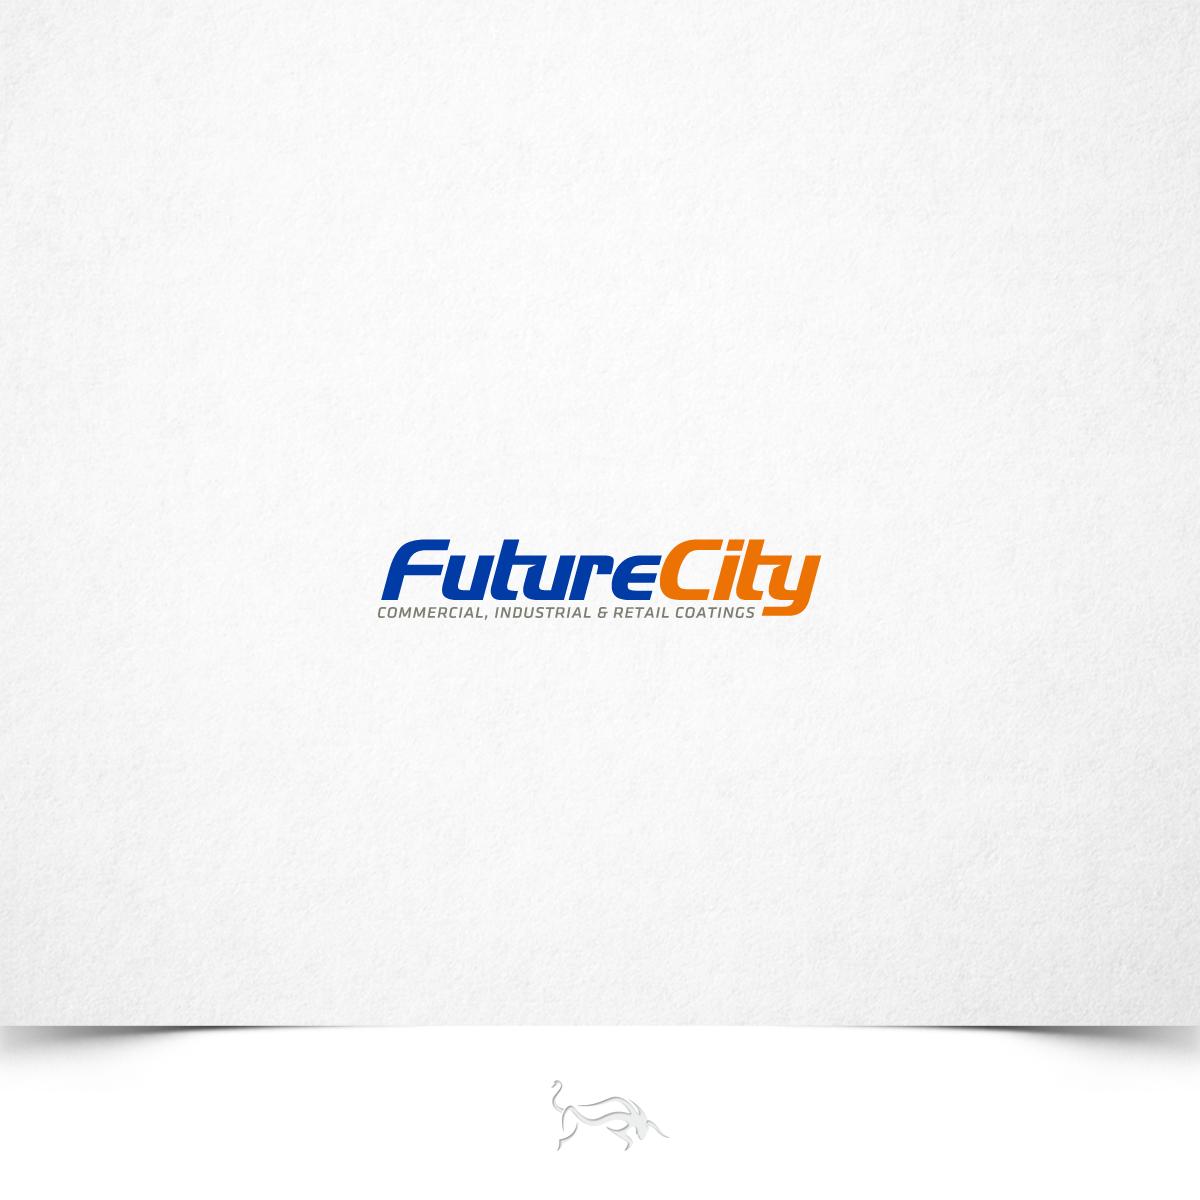 FUTURE CITY NEEDS YOU TO LOGO US UP!!!!